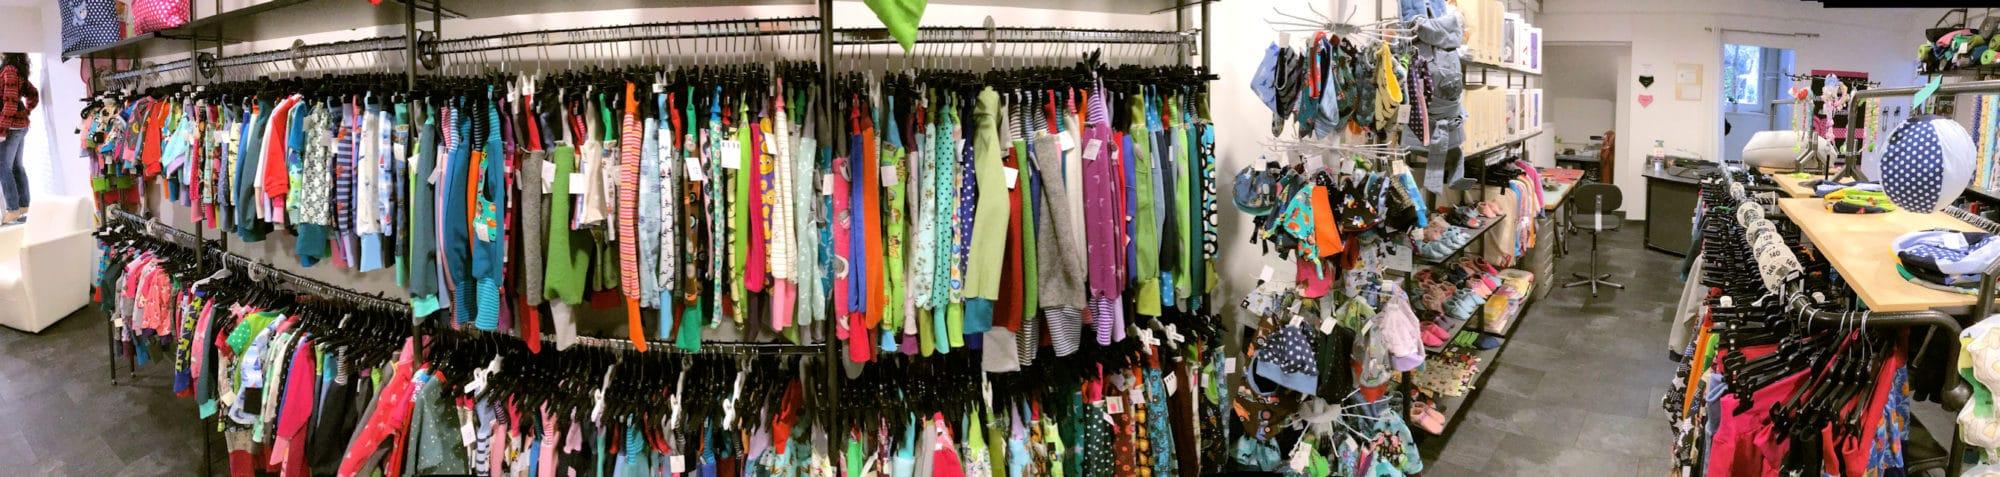 Panorama der Handmade-Kleidung